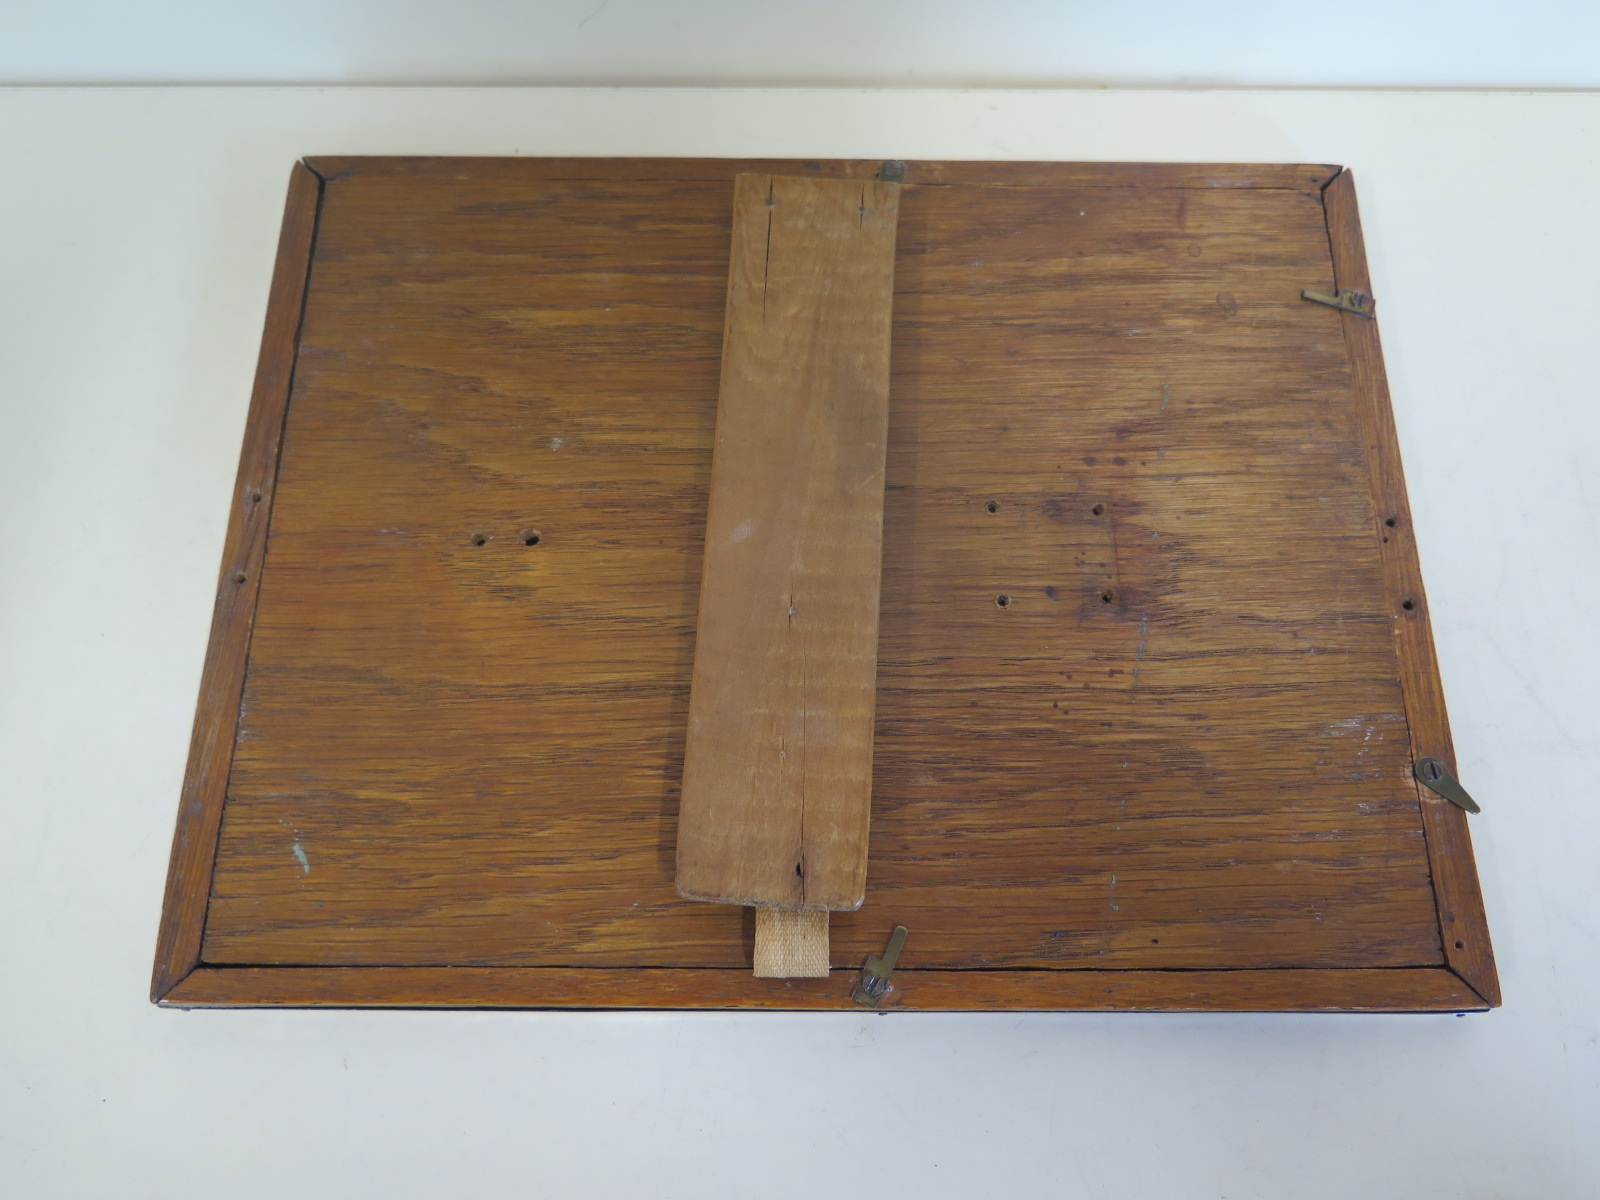 Lot 591 - An Edwardian silver photo frame, approx 17cm x 22cm